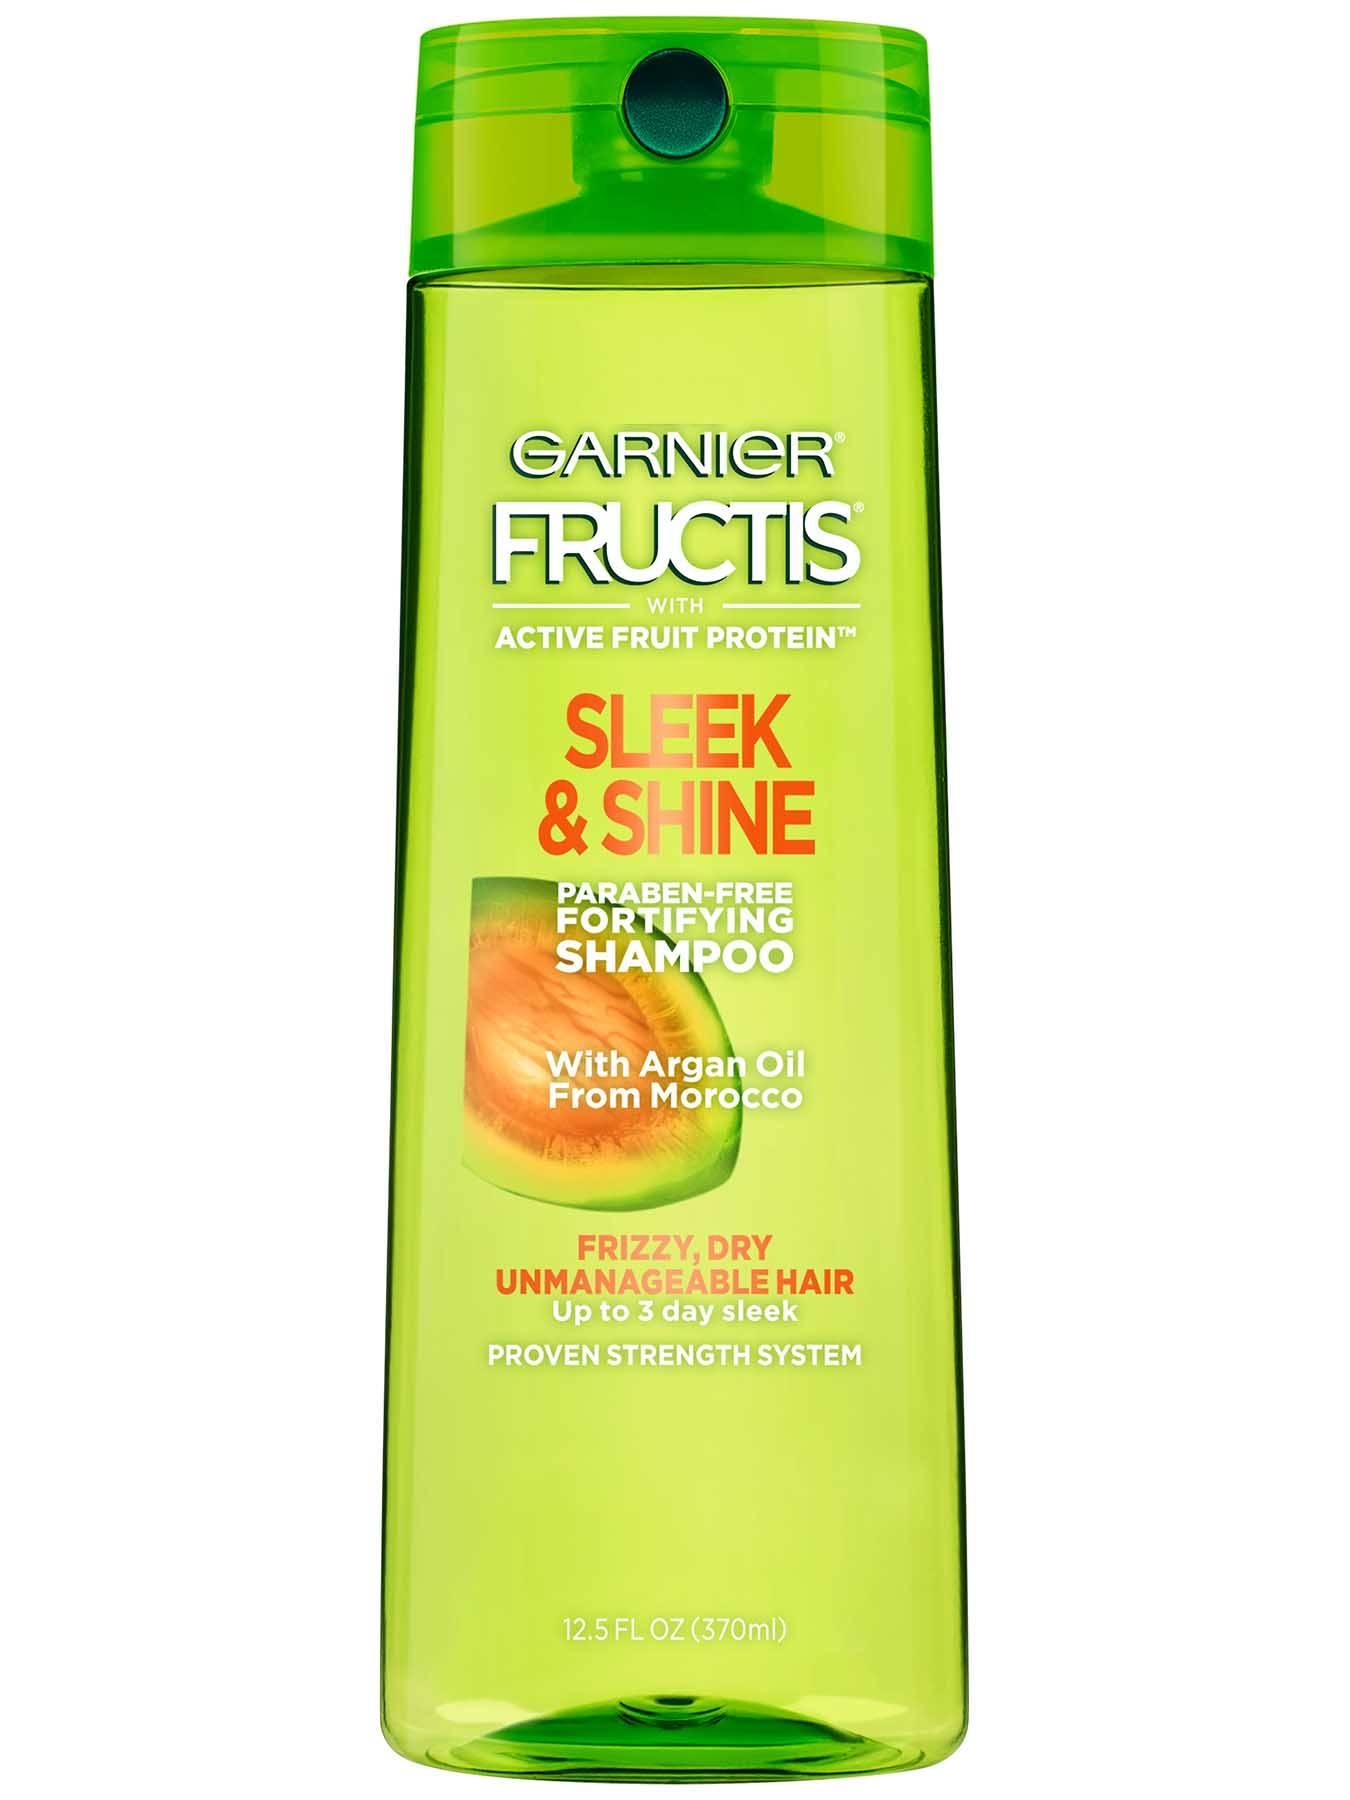 sleek and shine shampoo frizzy hair care garnier fructis